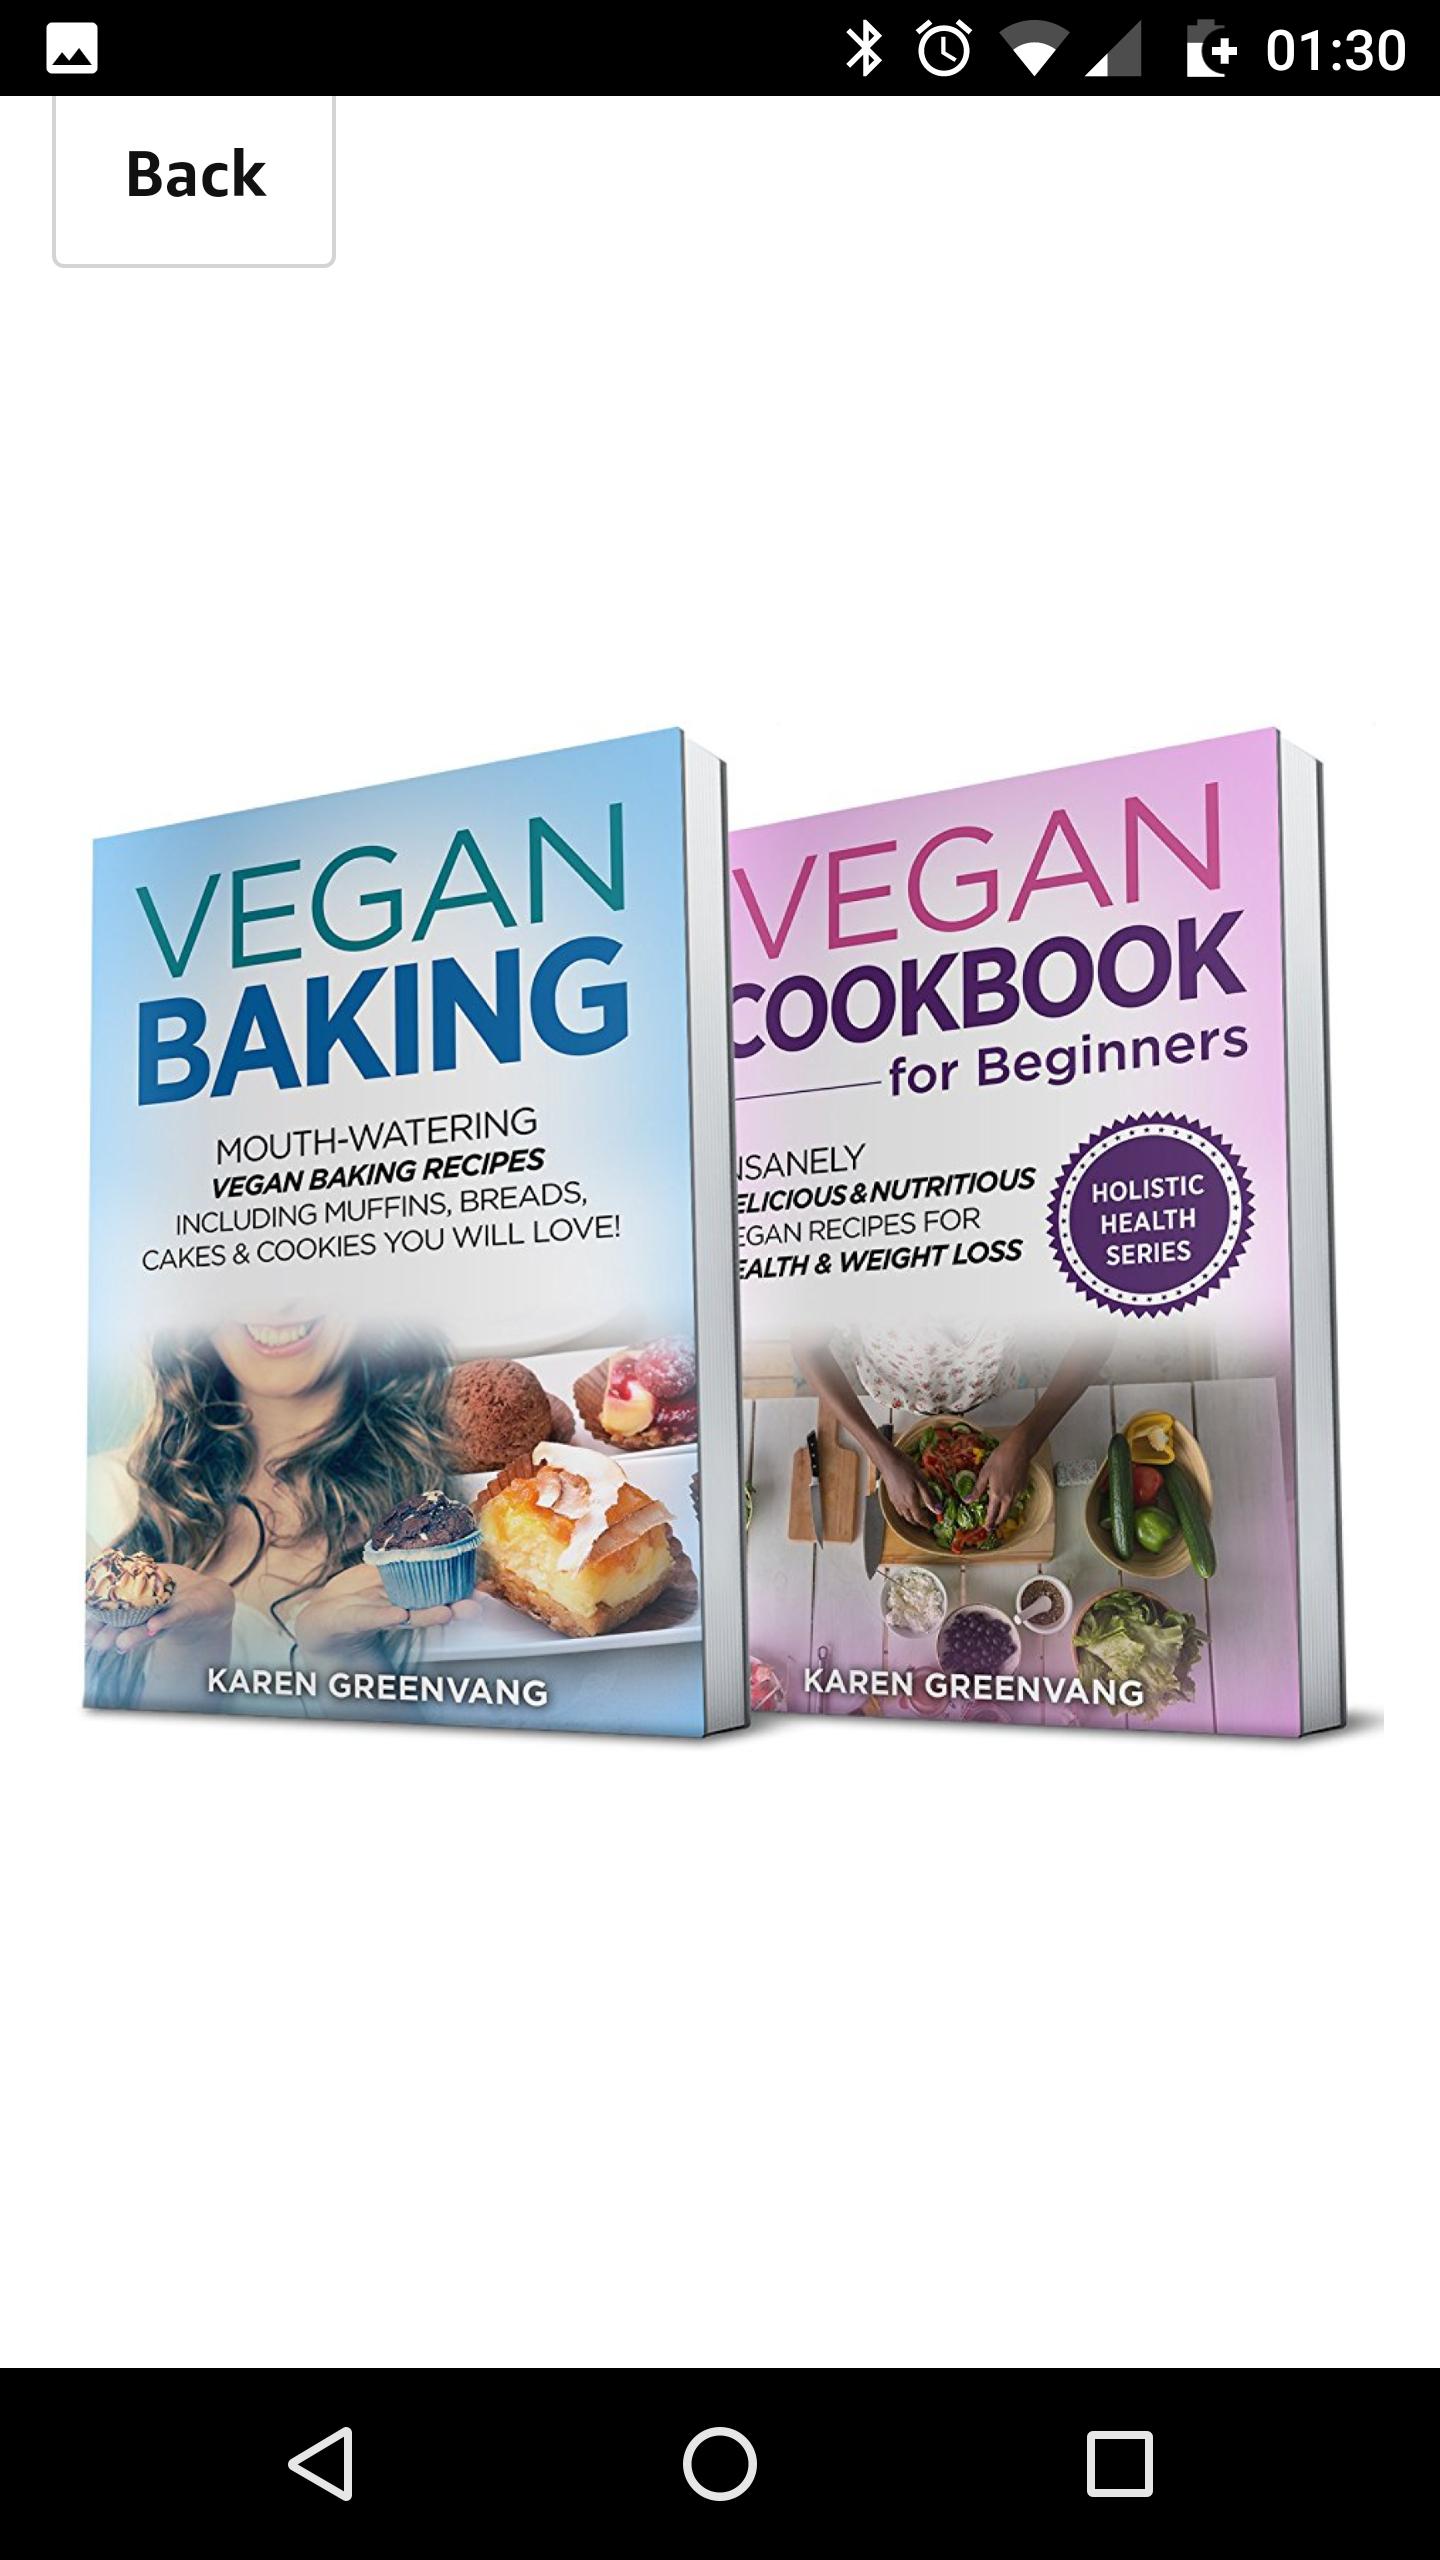 Free vegan diet books for beginners on Amazon